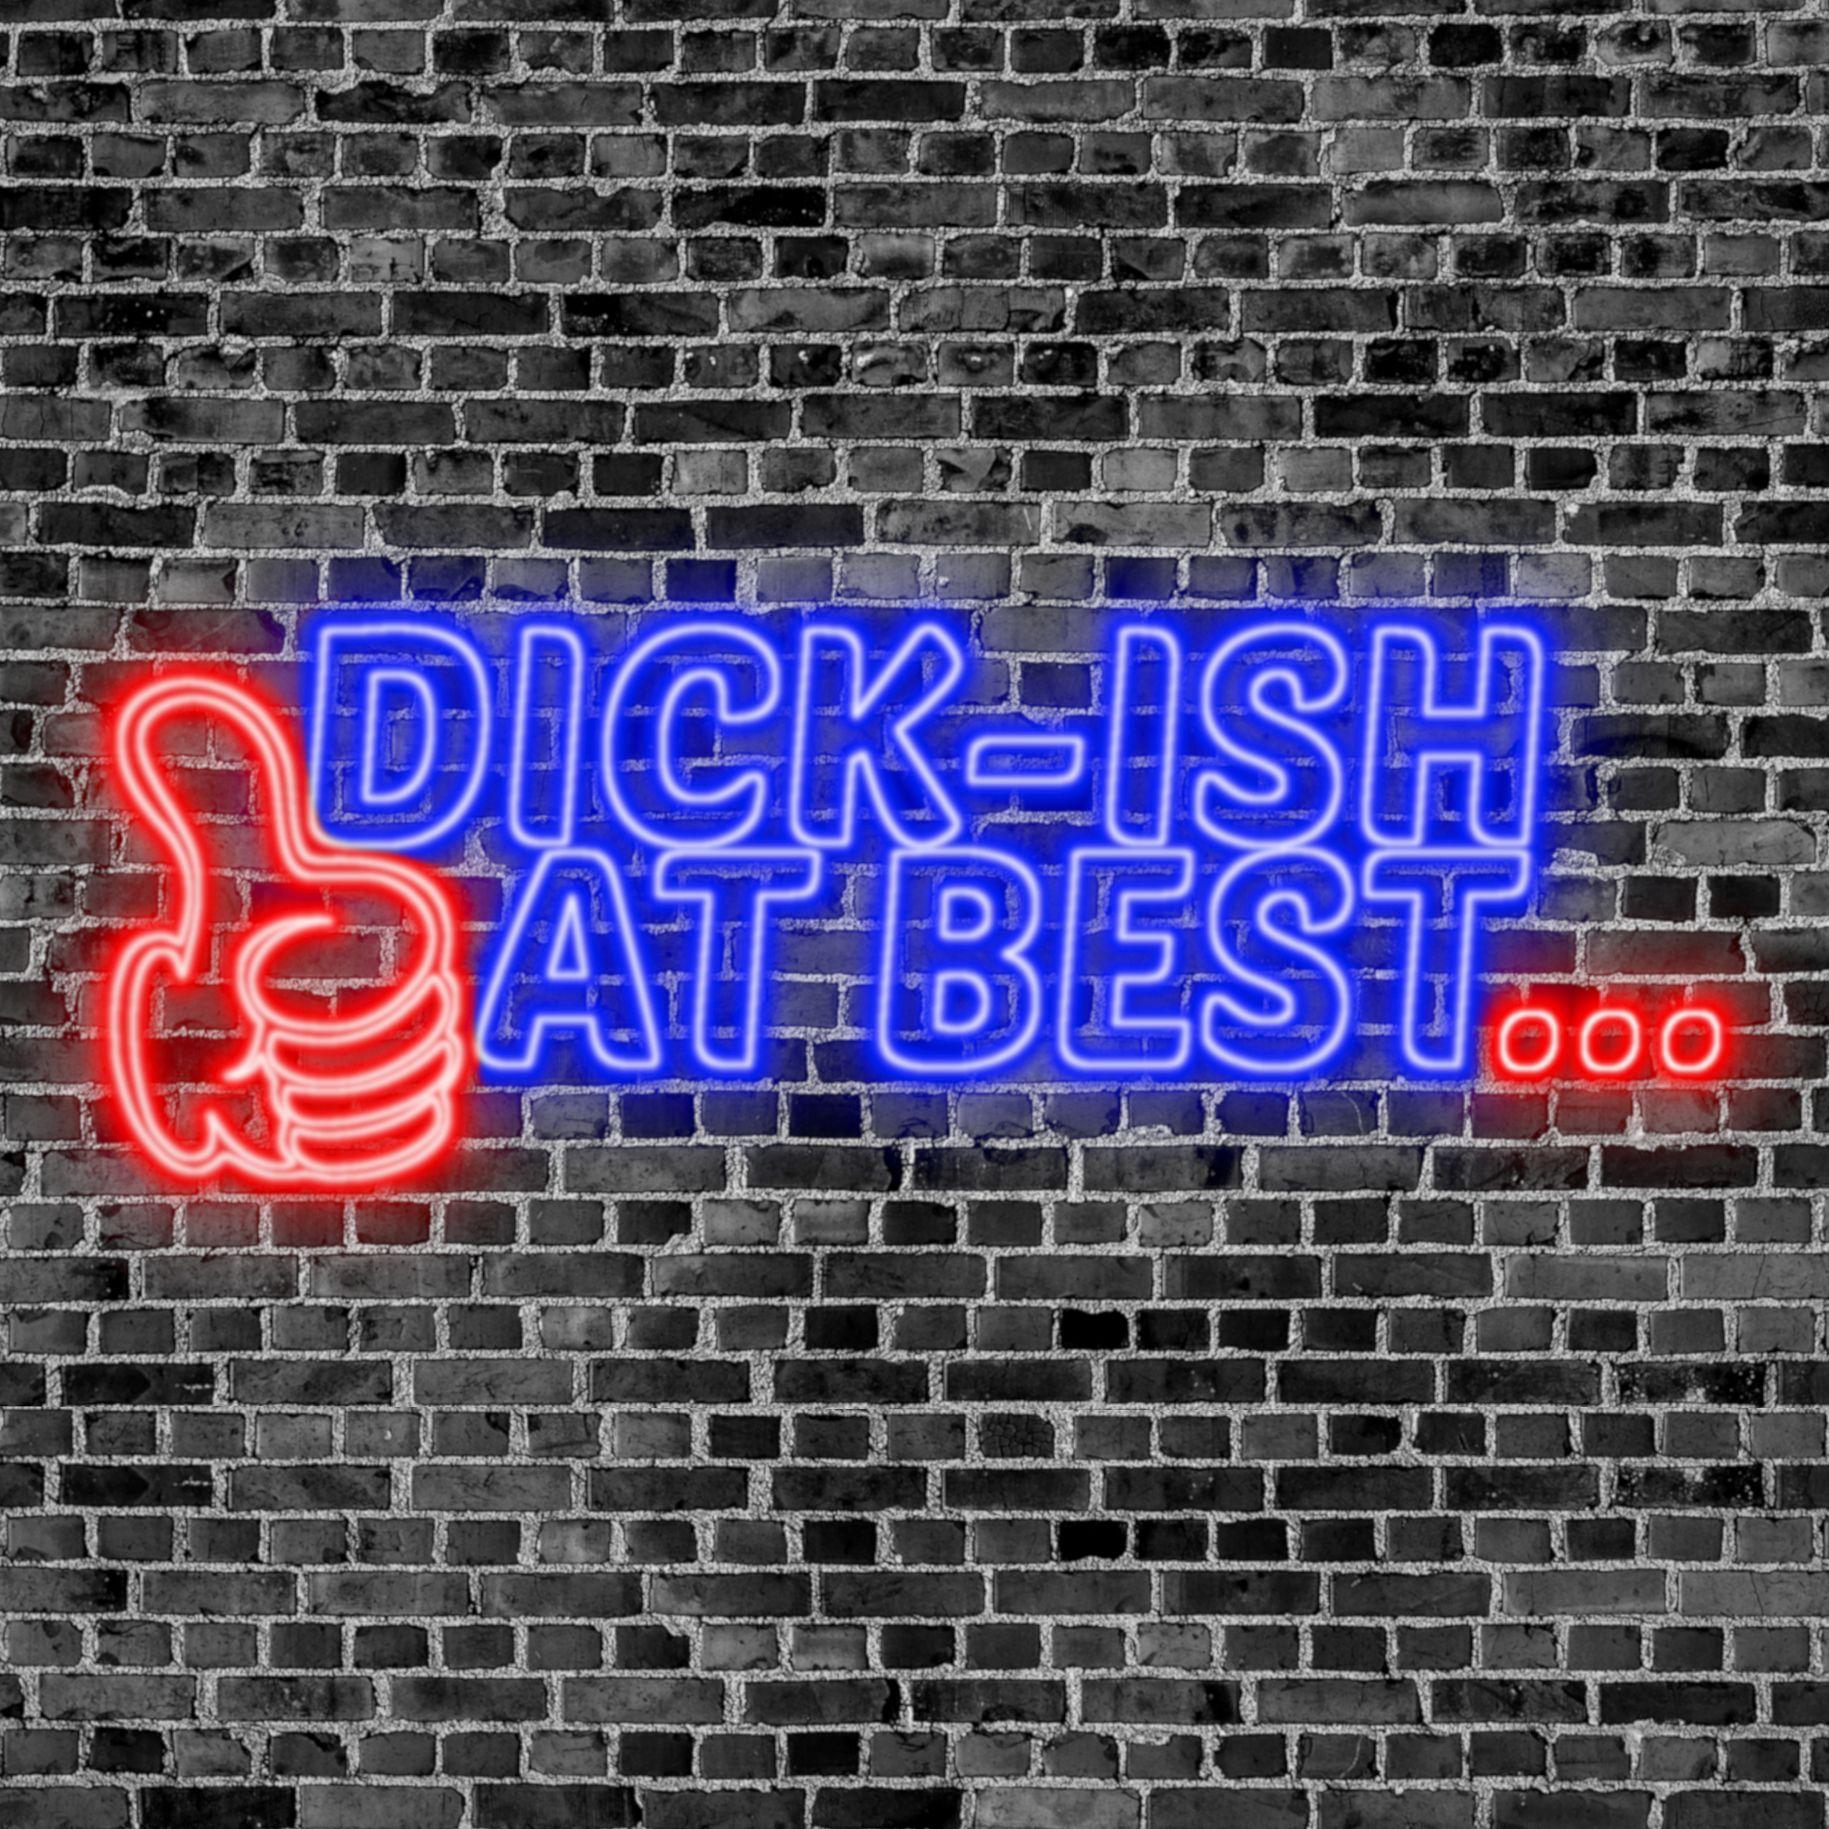 Dick-ish at Best